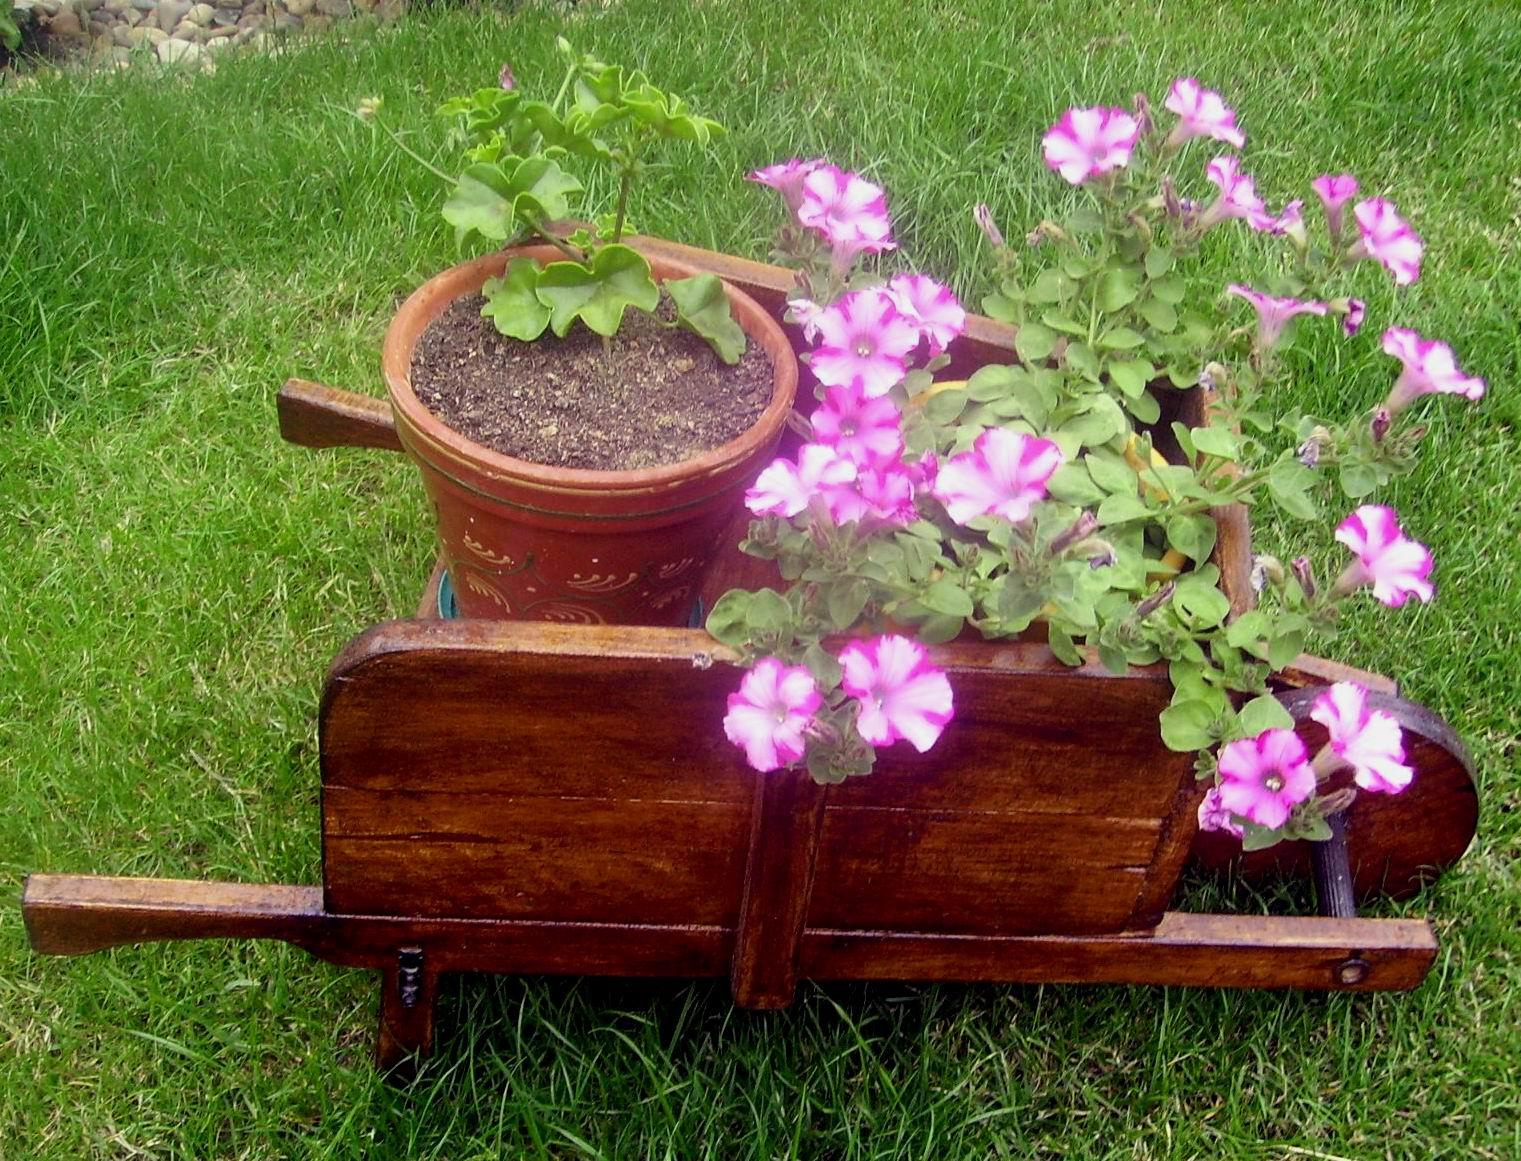 La bit cora de tini carretilla de madera for Guarda cosas para jardin